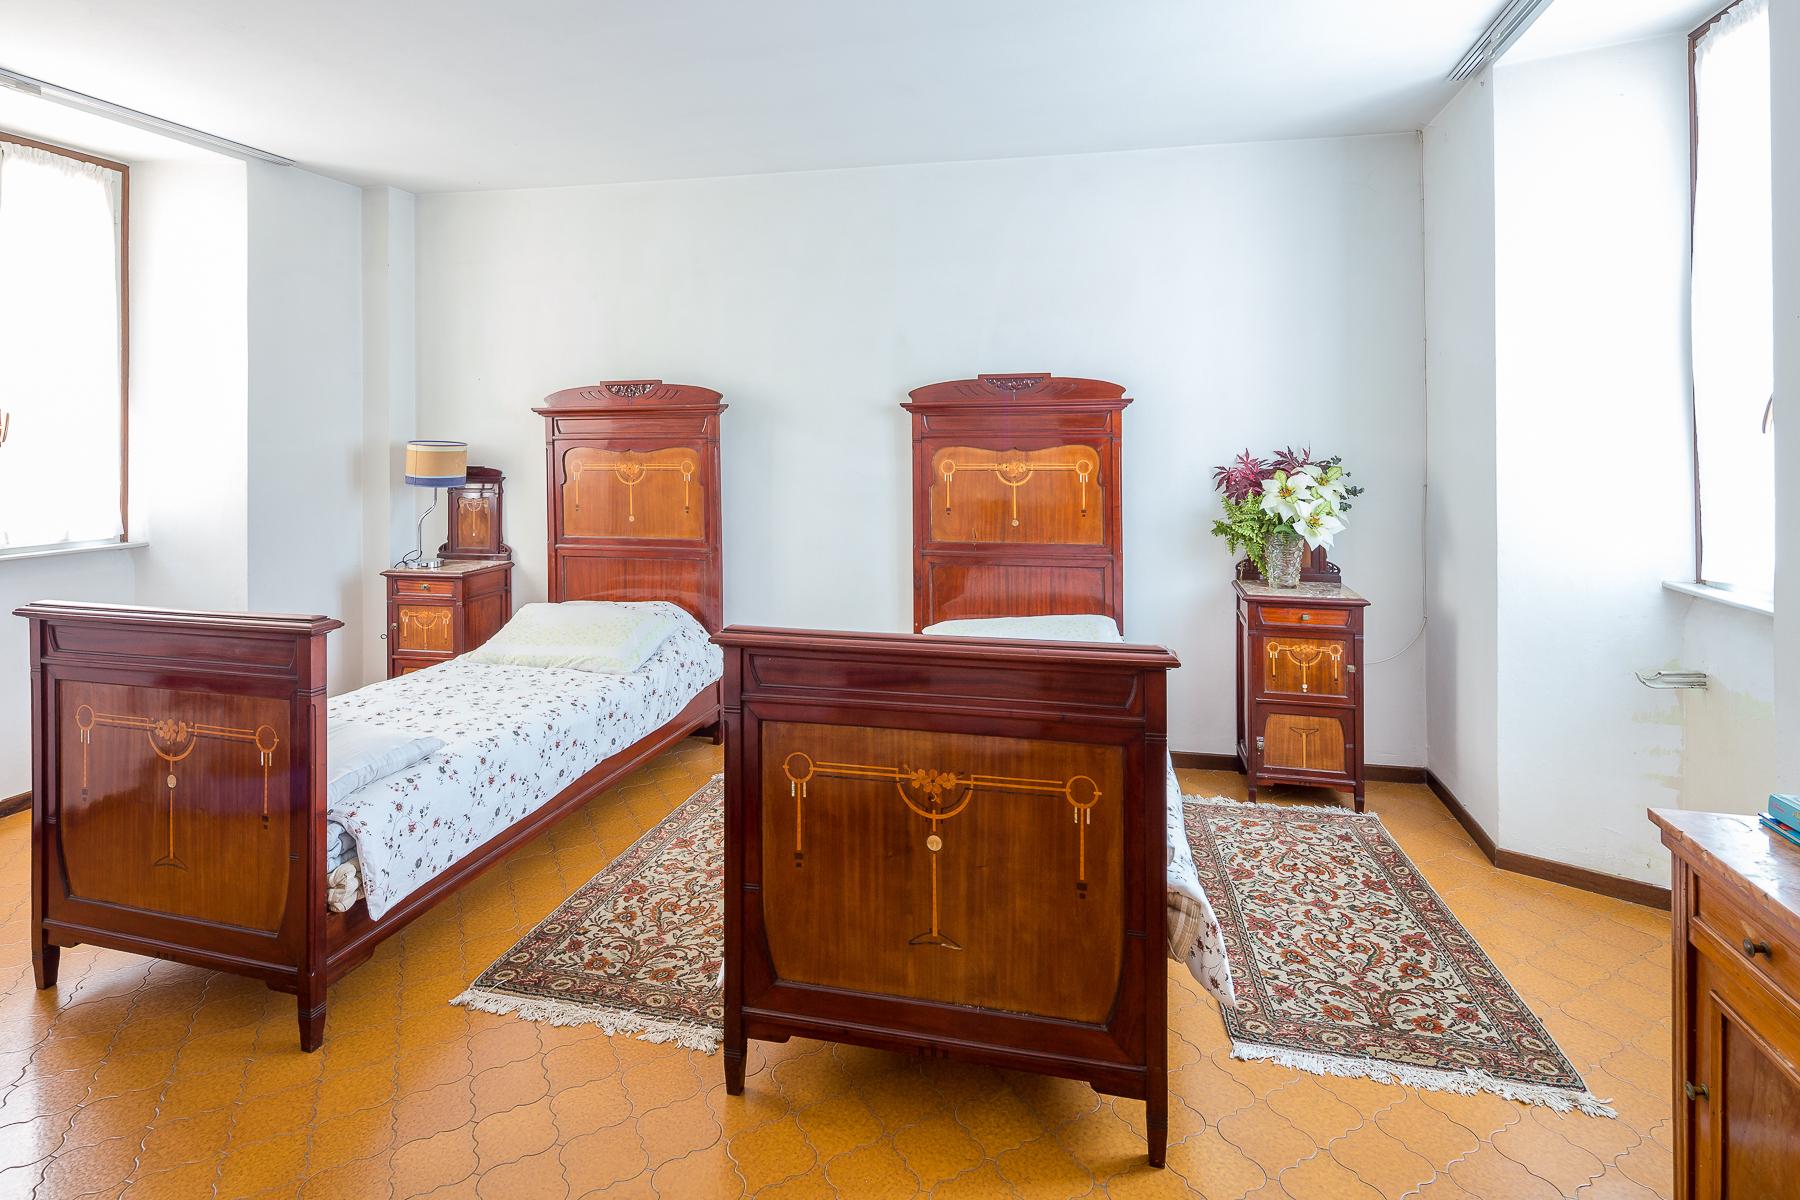 Casa indipendente in Vendita a Pella: 5 locali, 292 mq - Foto 11